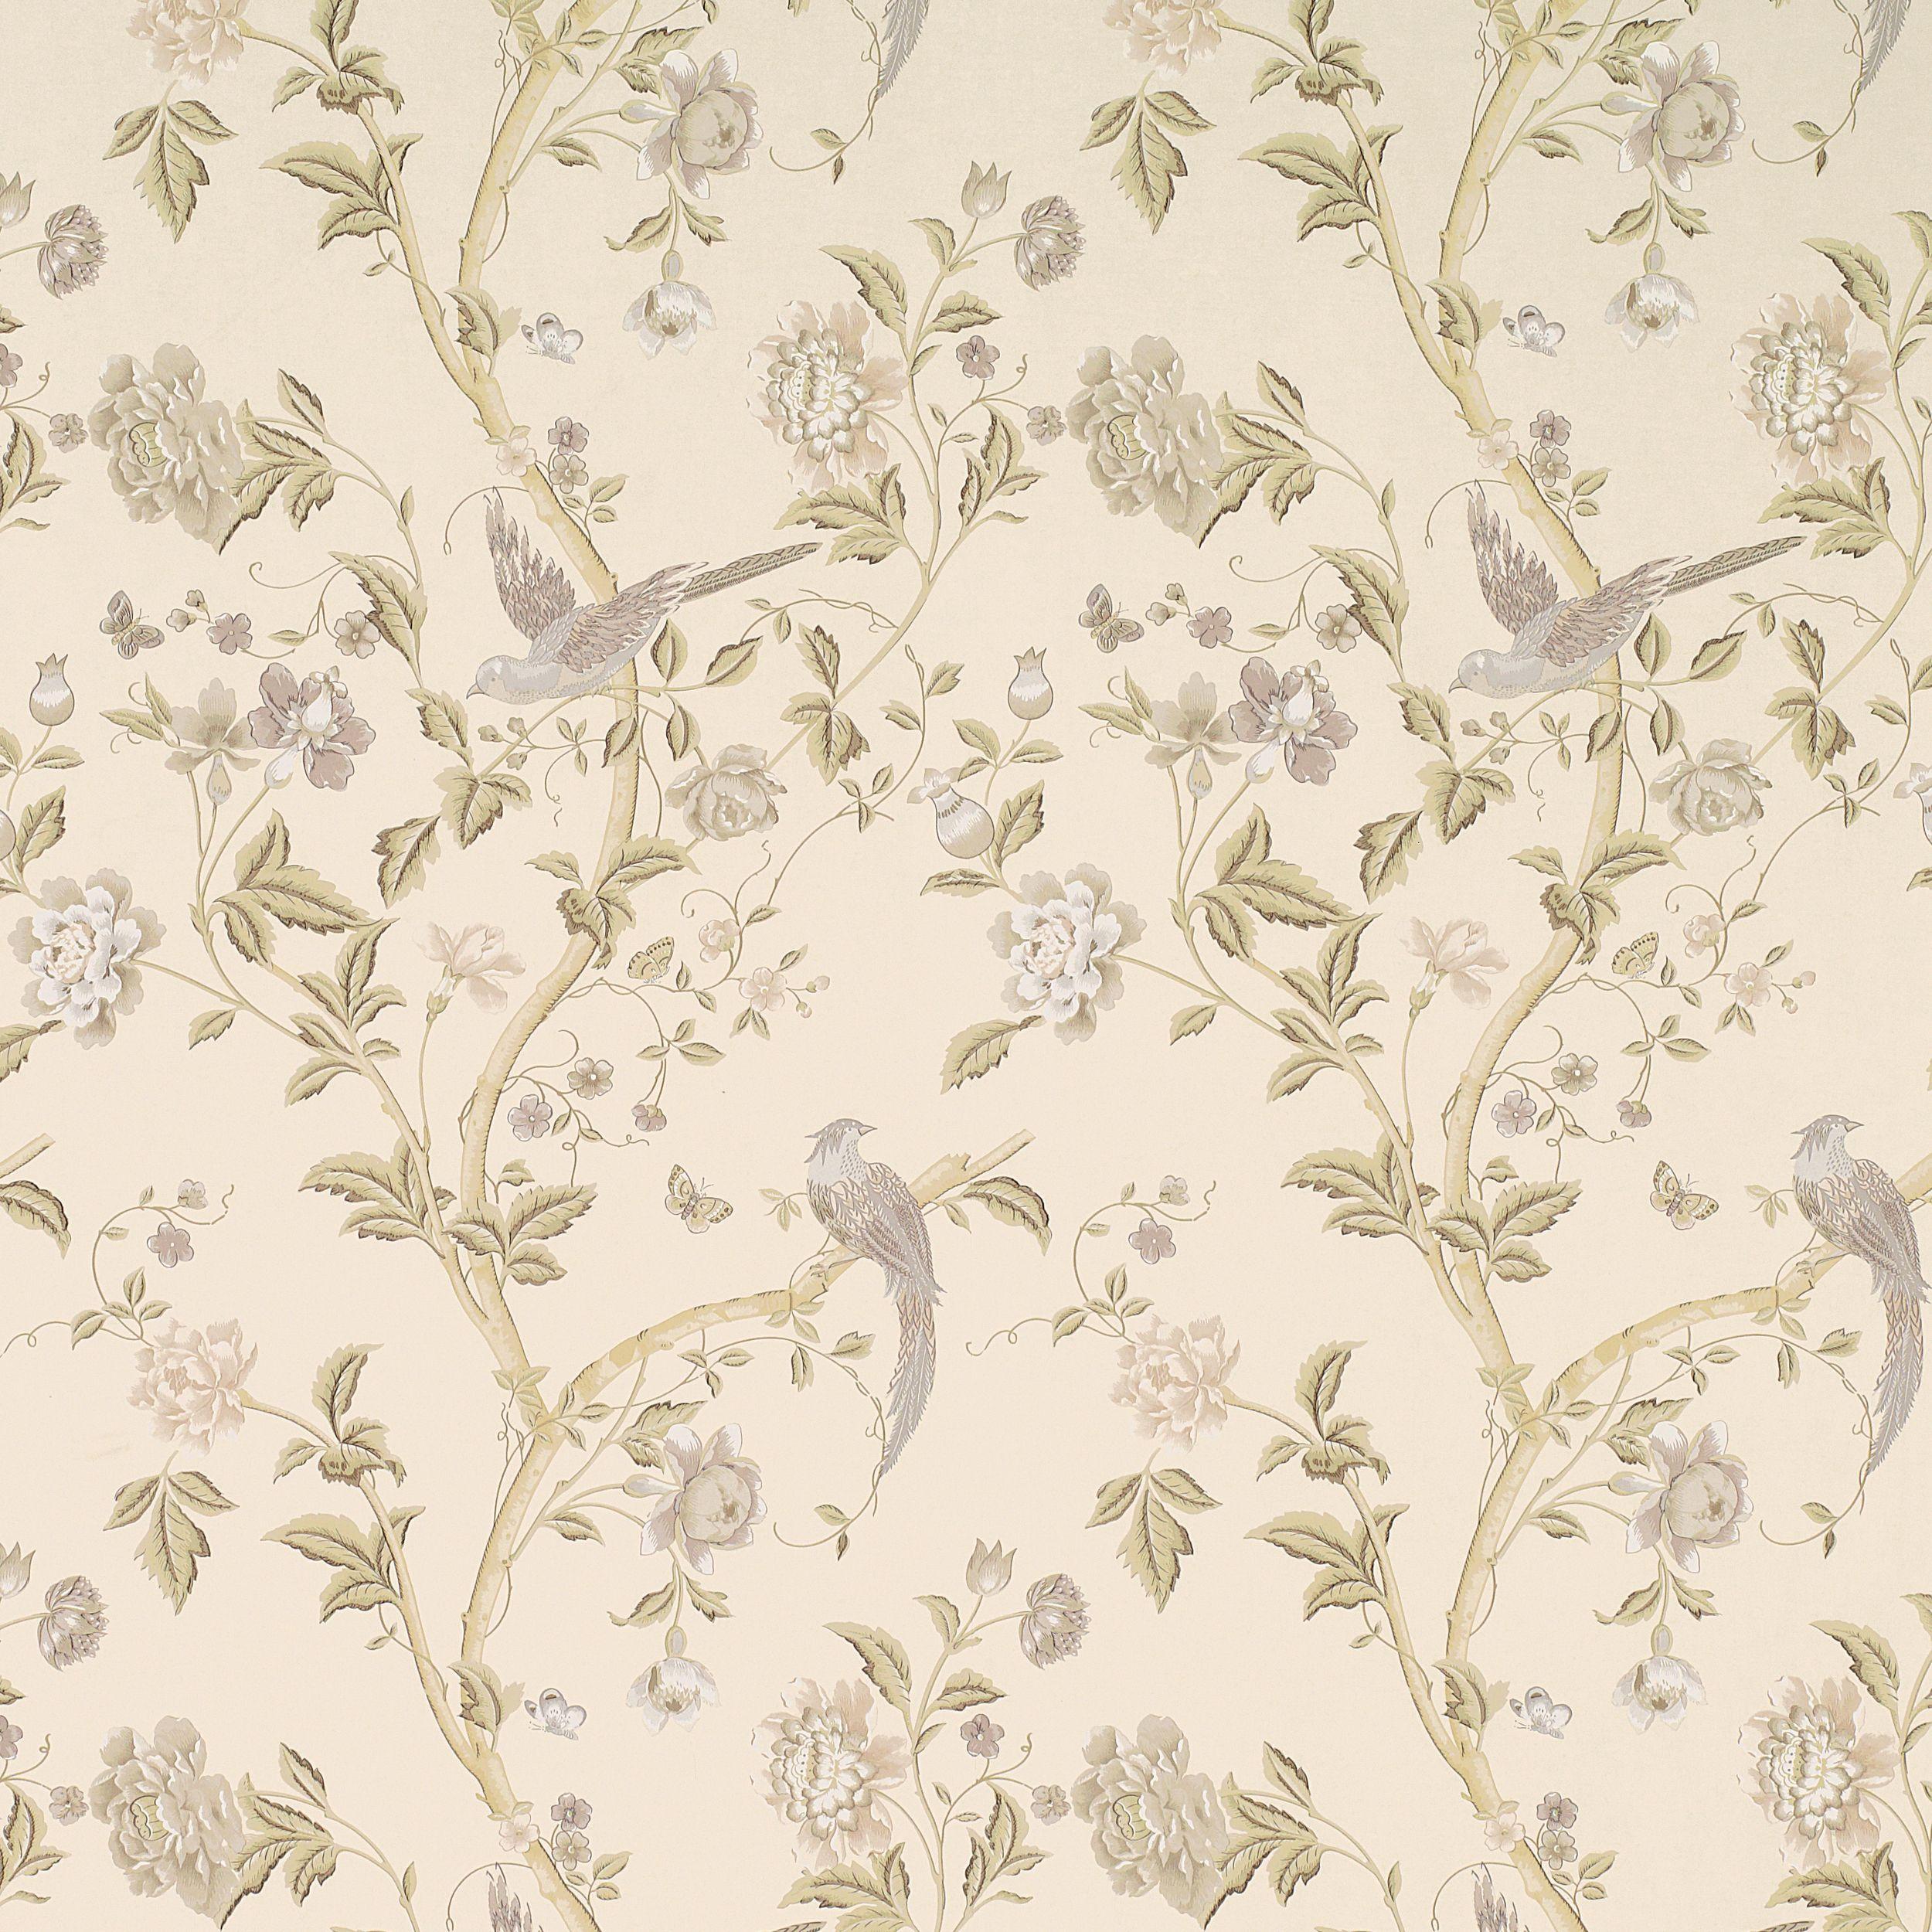 Http Wwwlauraashleycom Summer Palace Taupeivory Floral